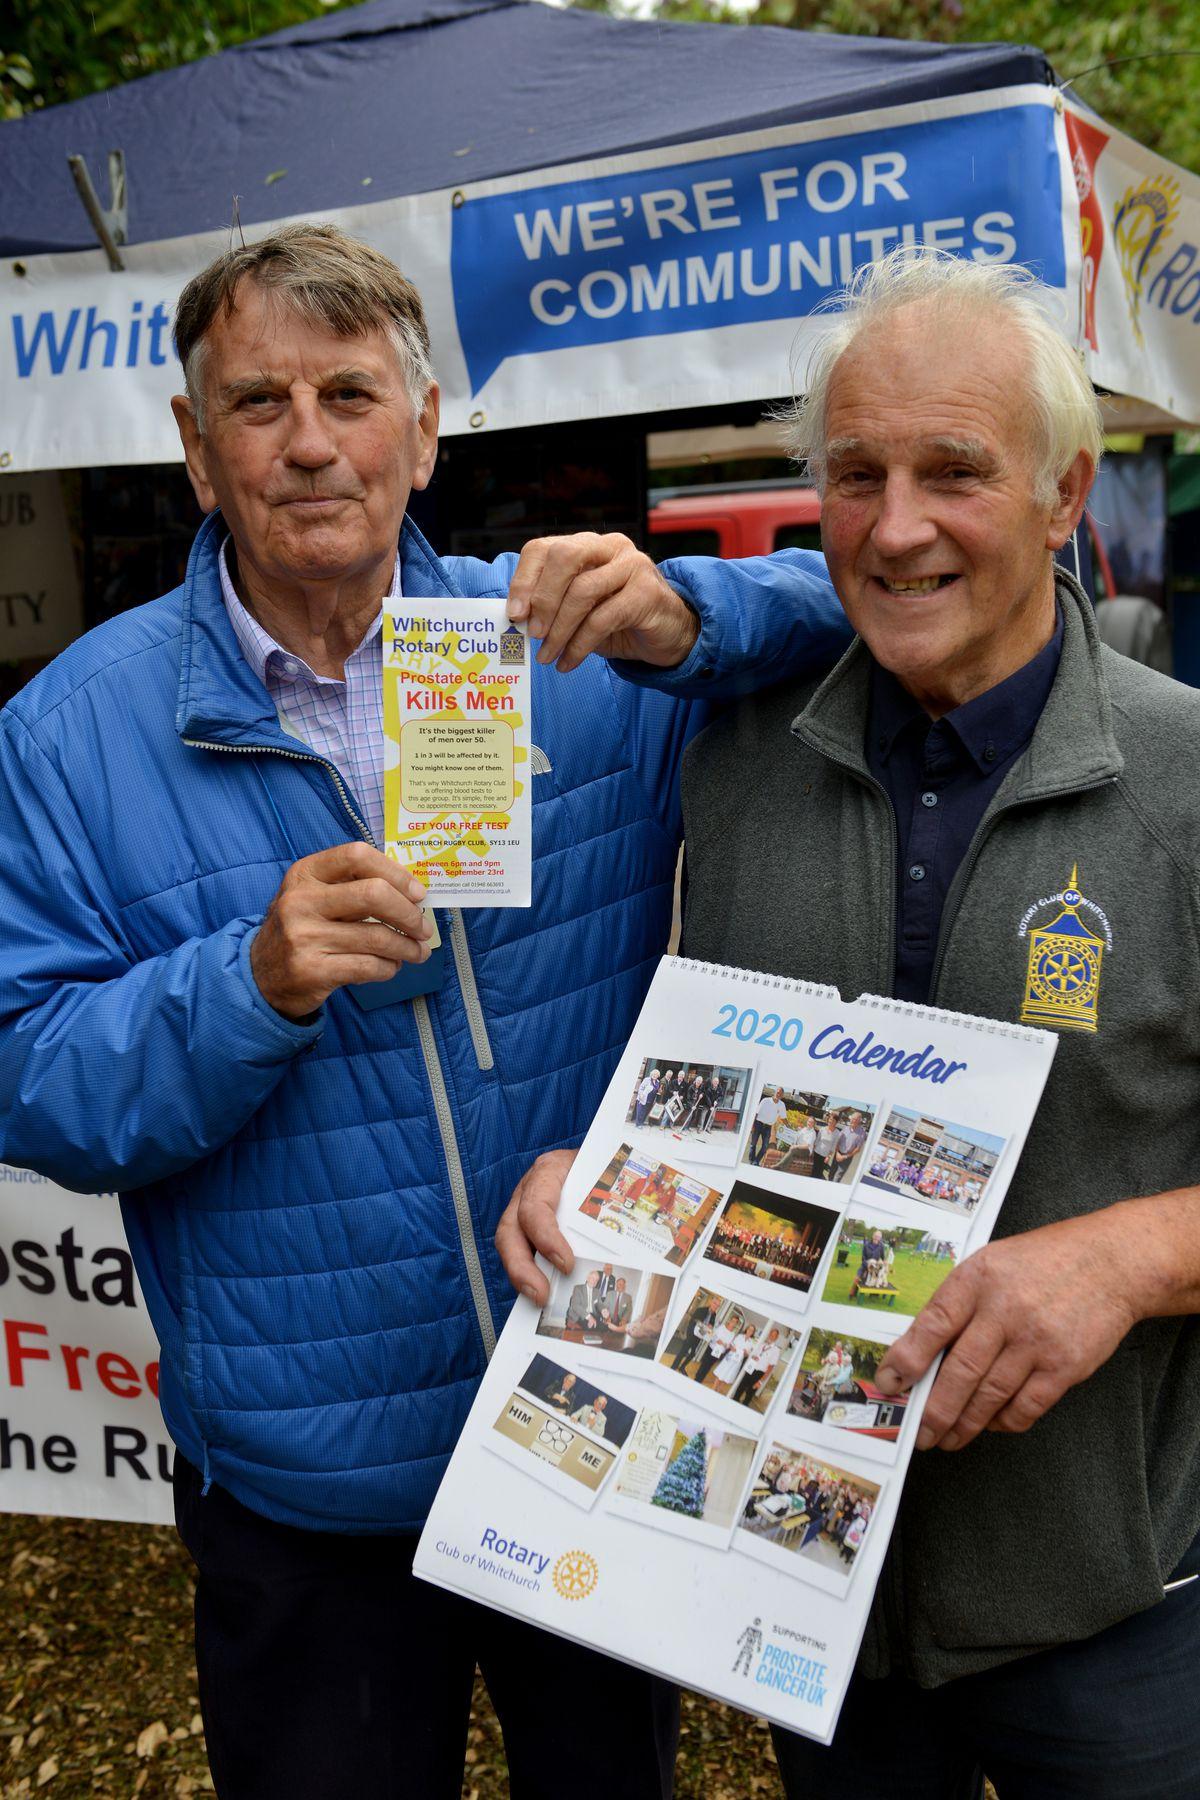 Howard Jones and Keith Senior from the Rotary Club